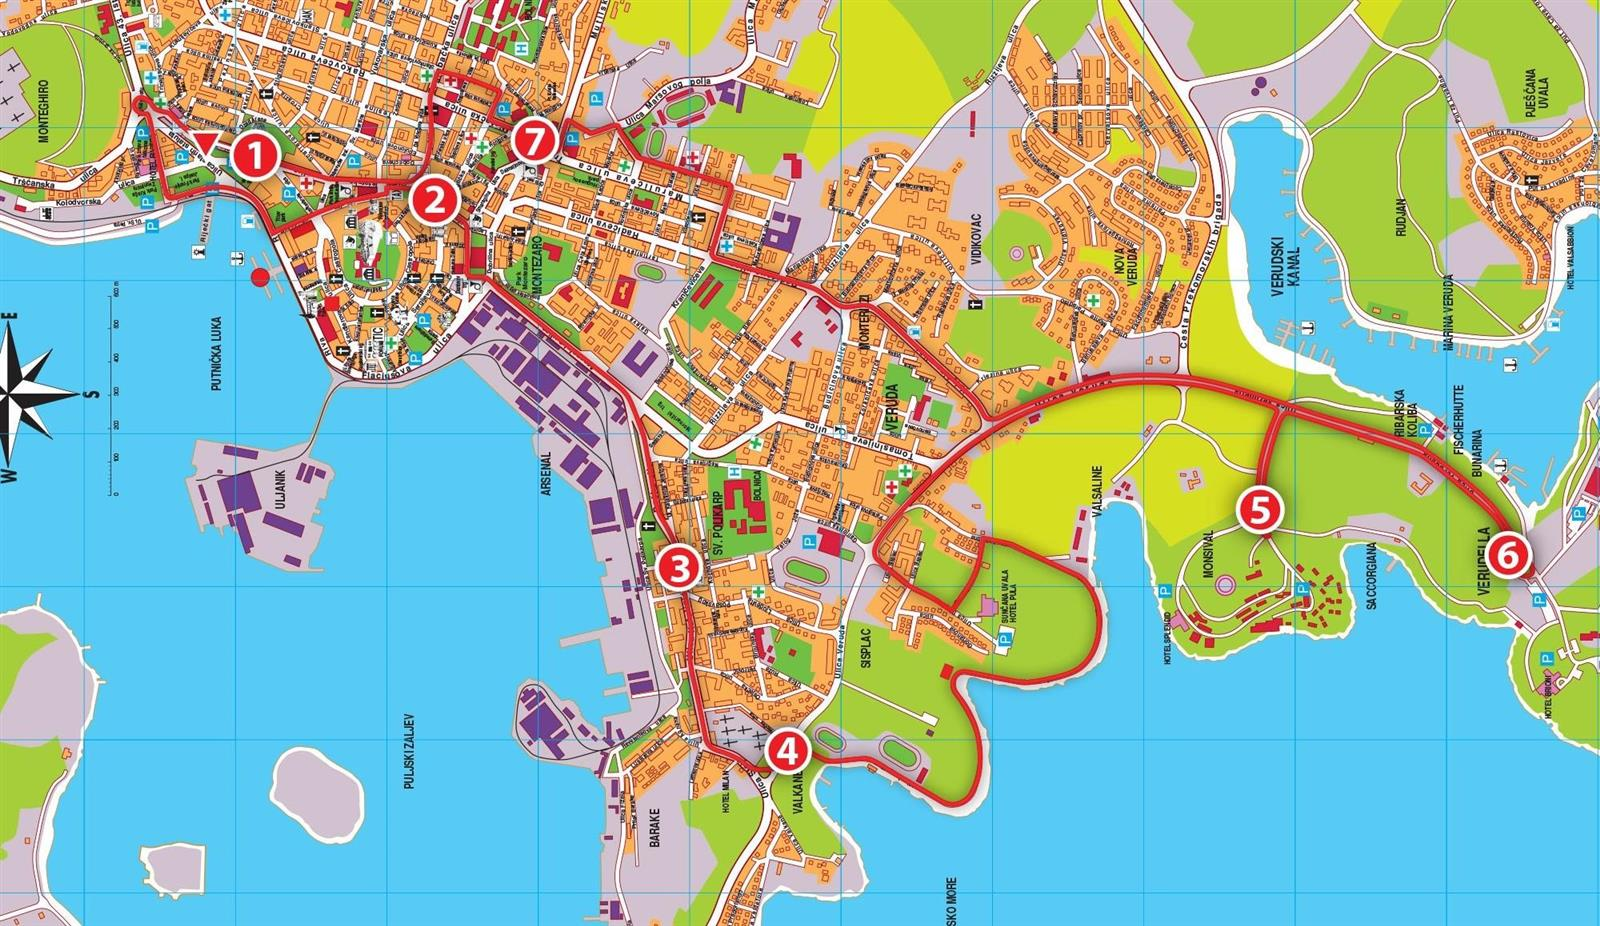 Karte Kroatien Pula.Pula City Tour Stadtrundfahrt Pula